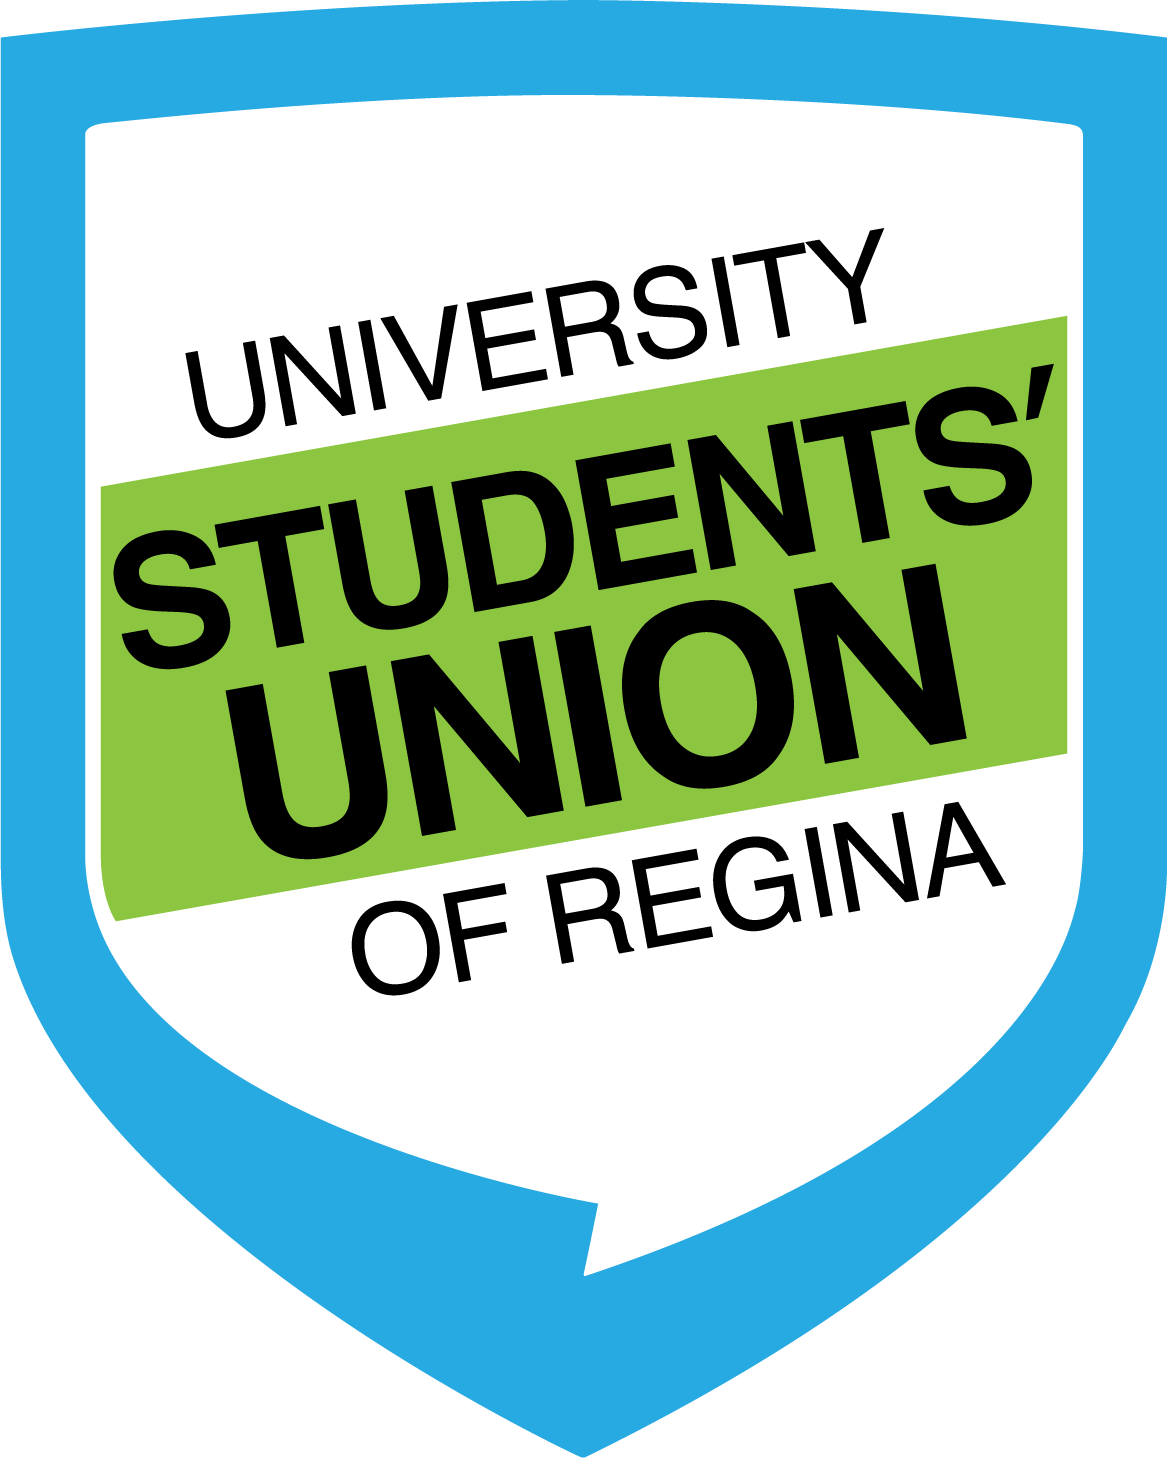 URSU Responds to University of Regina Classes Remaining Online for Fall